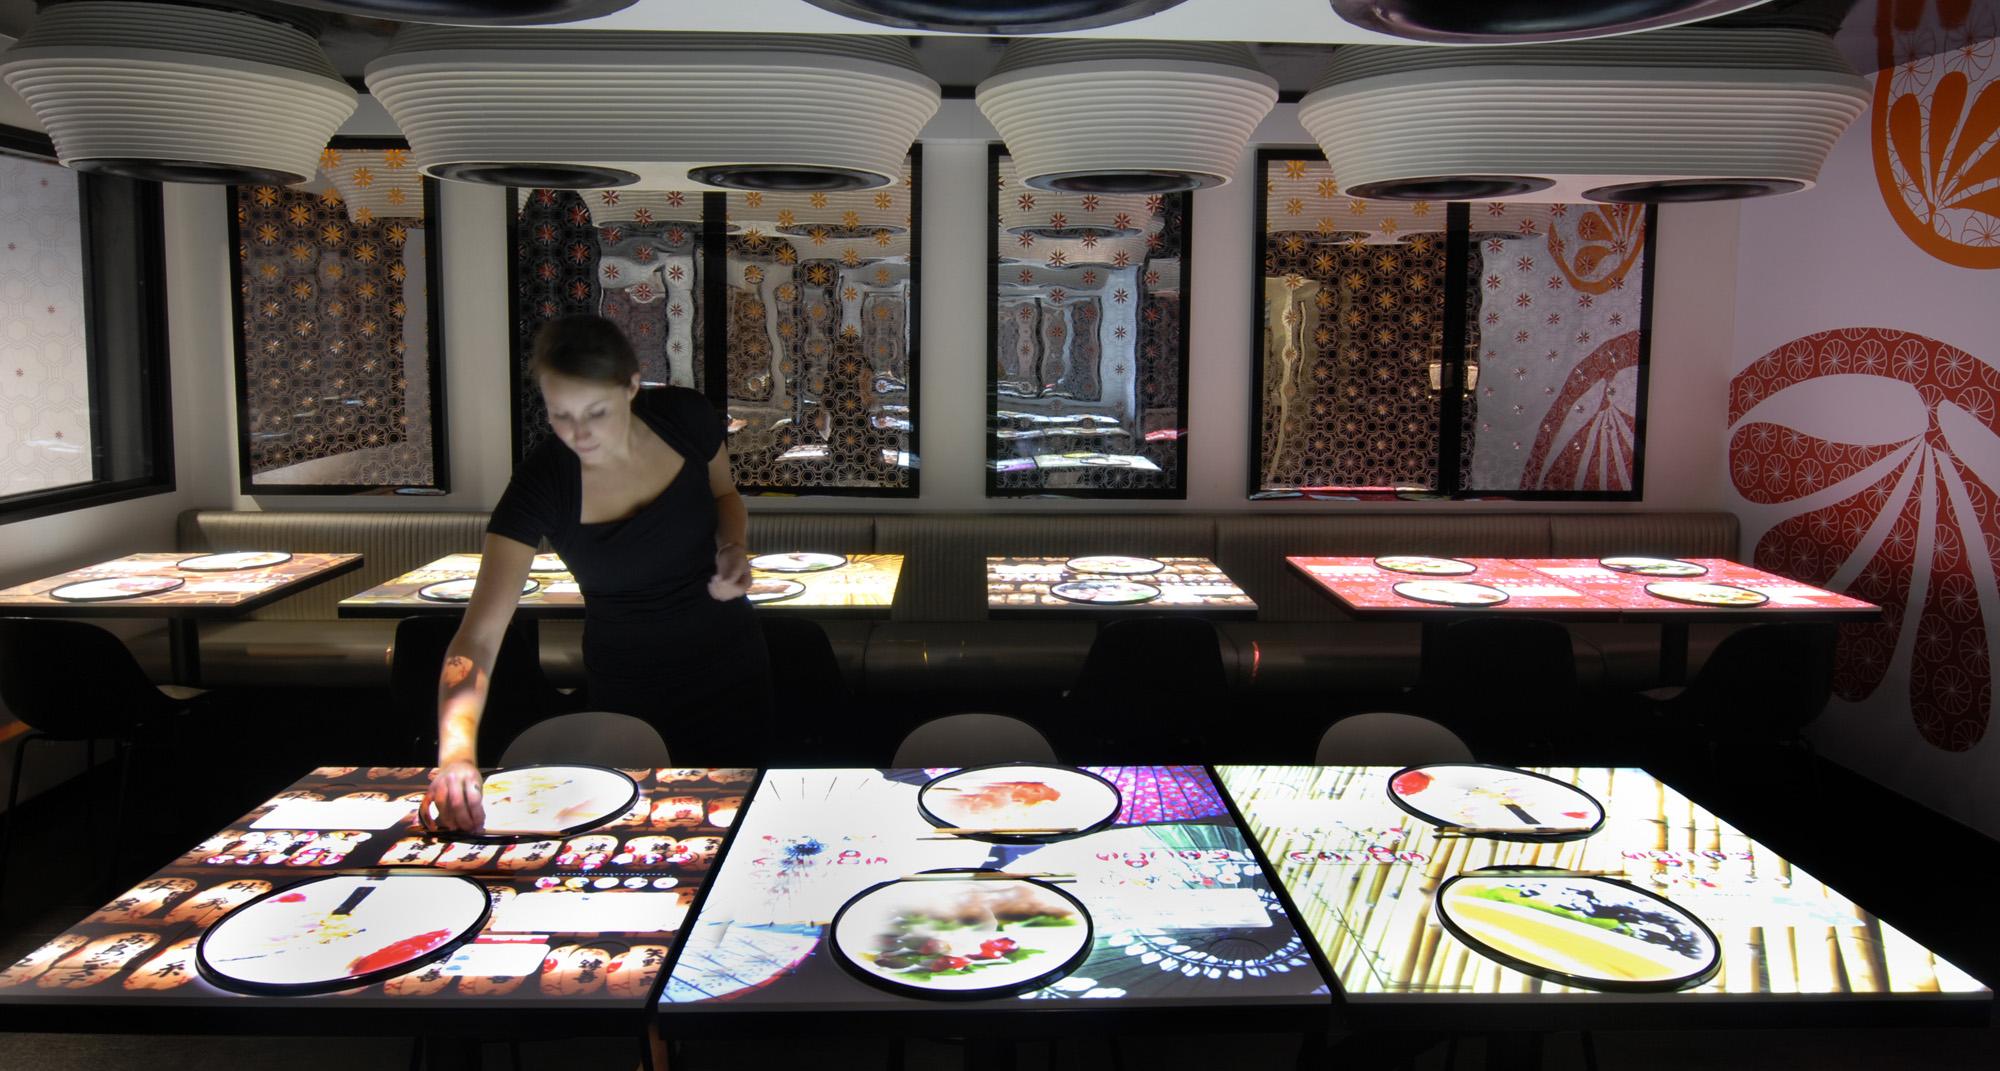 Inamo soho london interactive games table